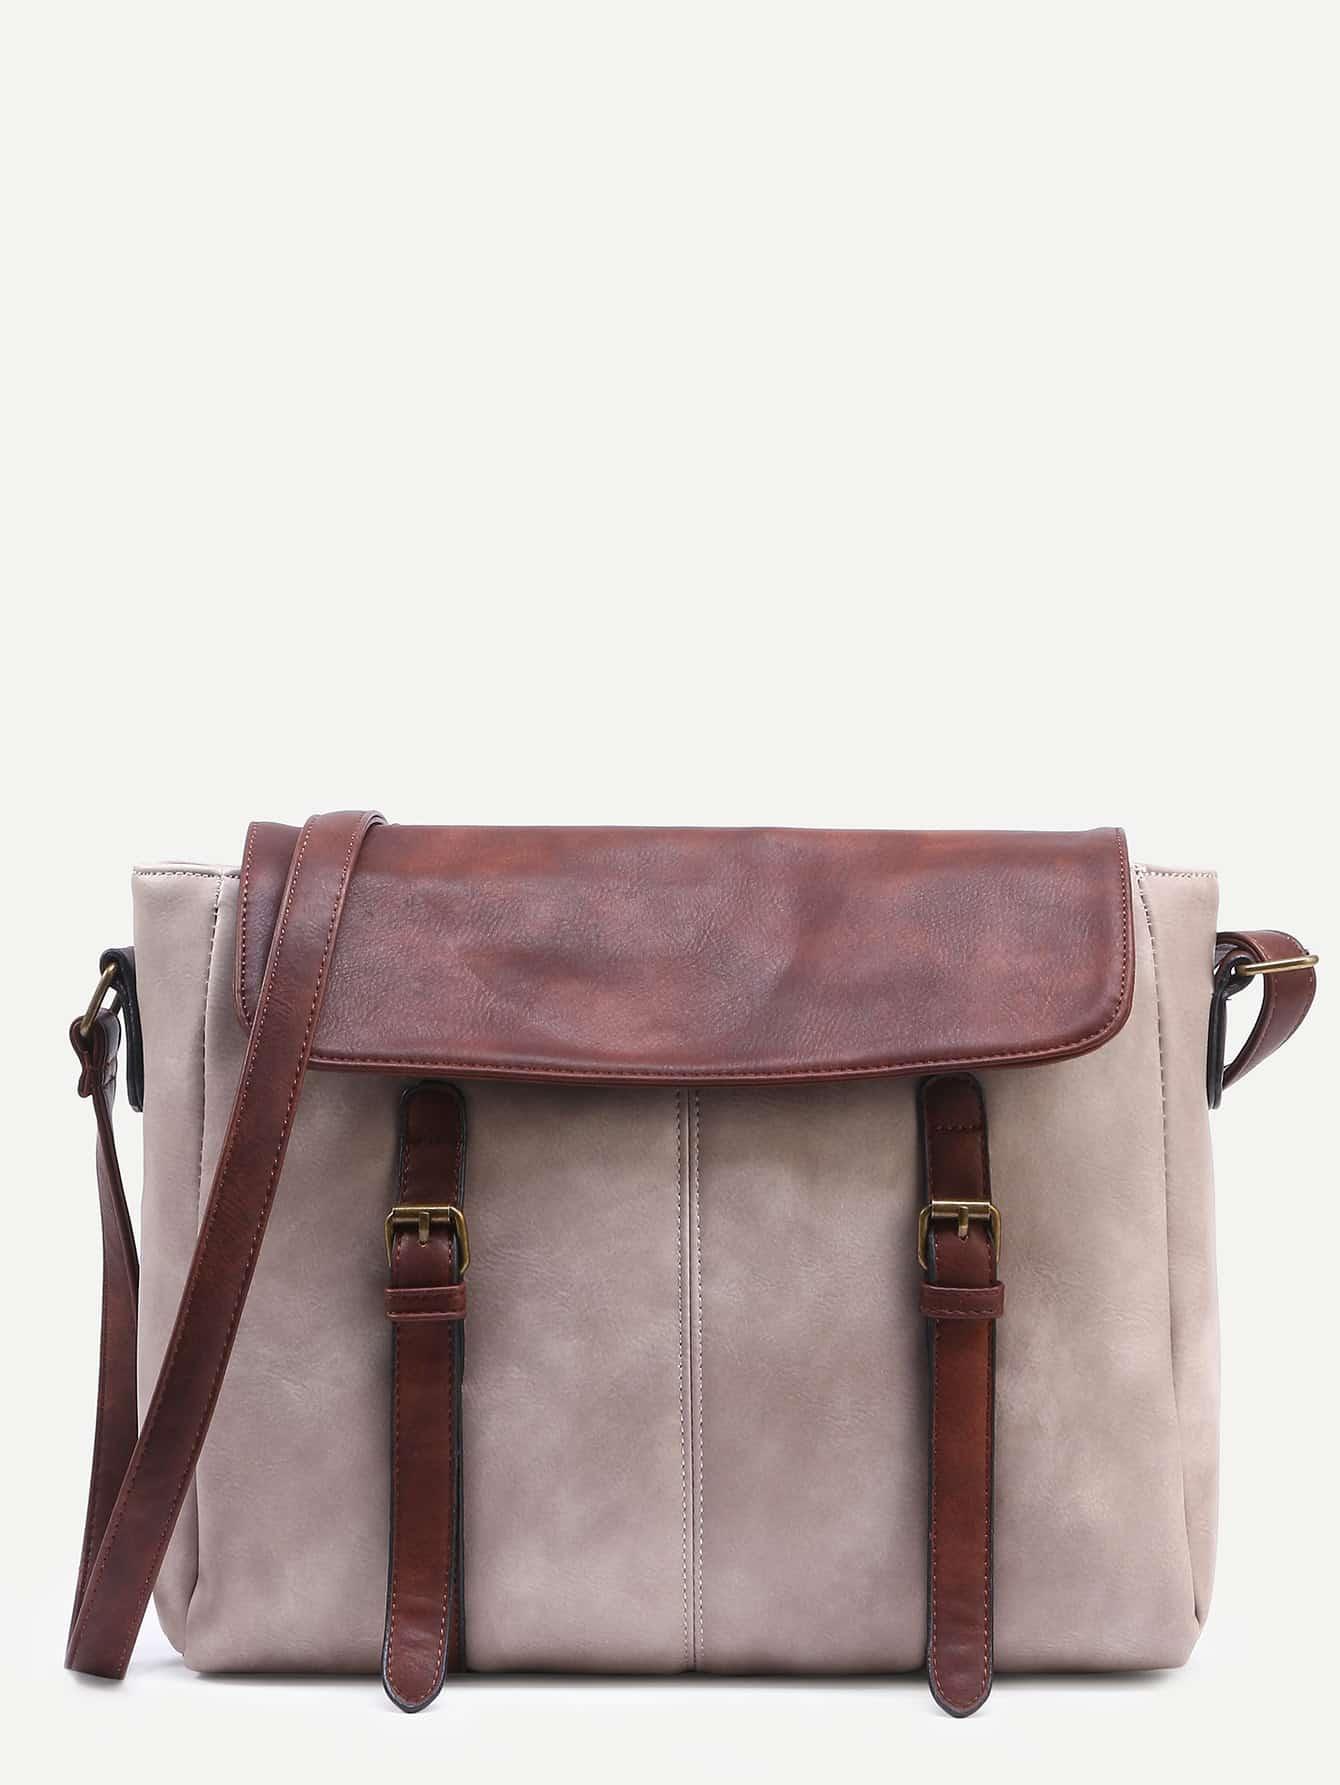 Grey Contrast Flap Dual Buckled Strap Messenger Bag